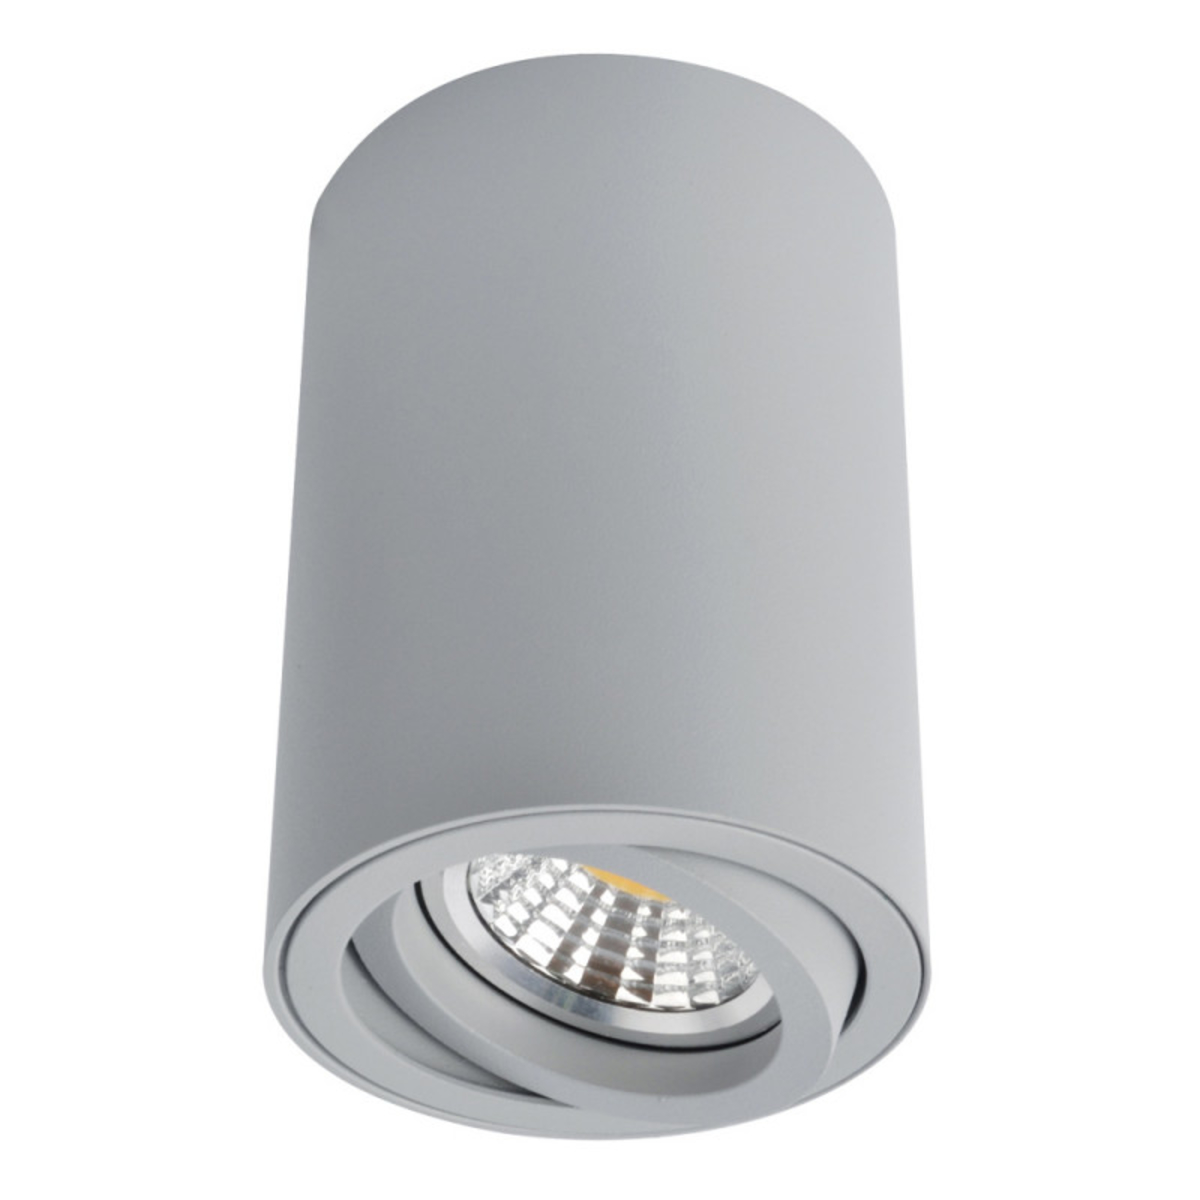 Купить Накладной светильник SENTRY Накладной светильник ARTE Lamp A1560PL-1GY (14727), HomeMe